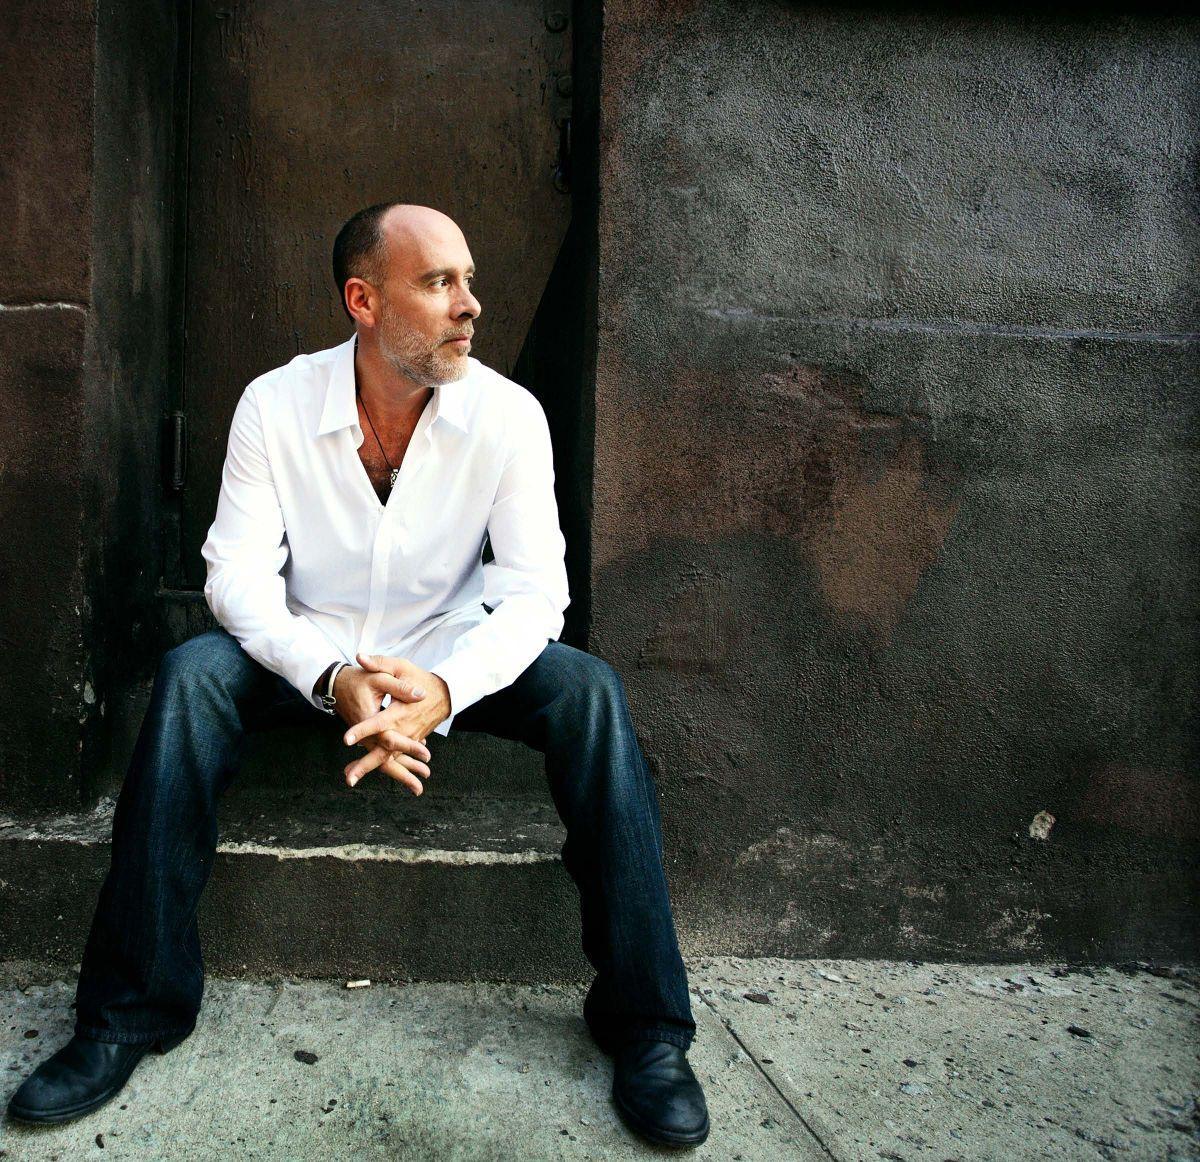 Ten feet off of Beale: Singer, songwriter Marc Cohn to perform in Hamilton Jan. 17